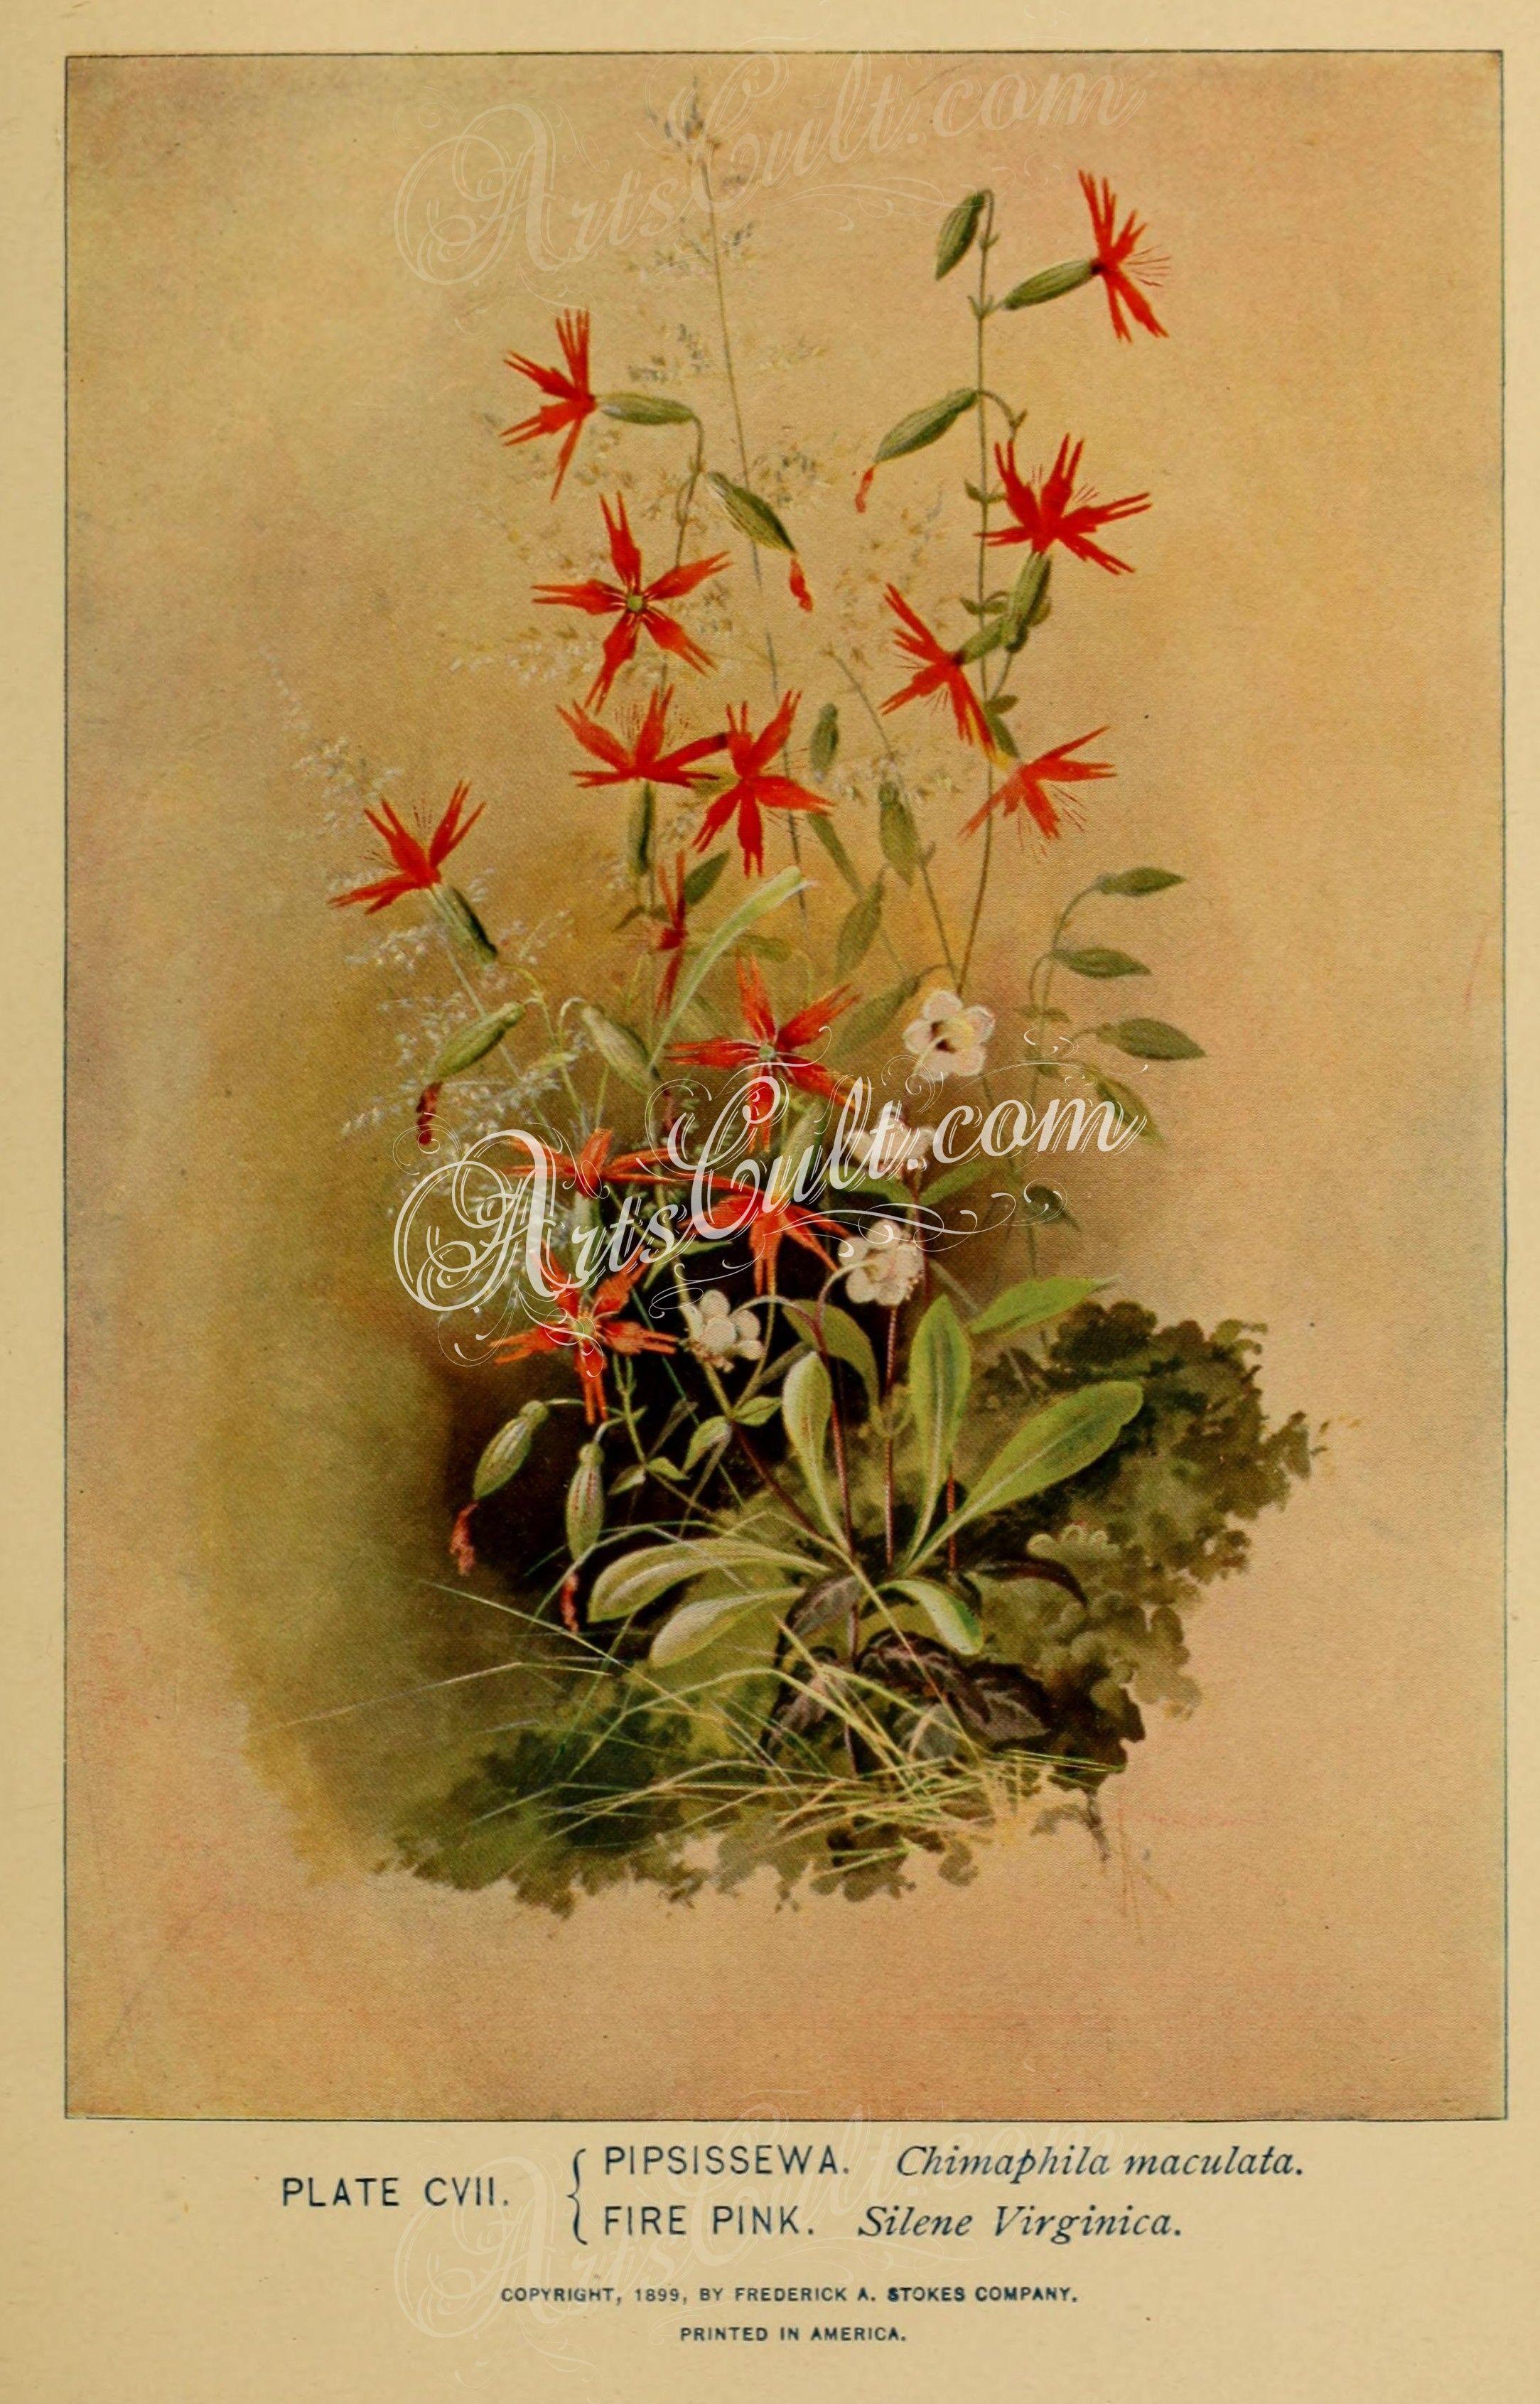 Flowers 30915 Pipsissewa Chimaphila Maculata Fire Pink Silene